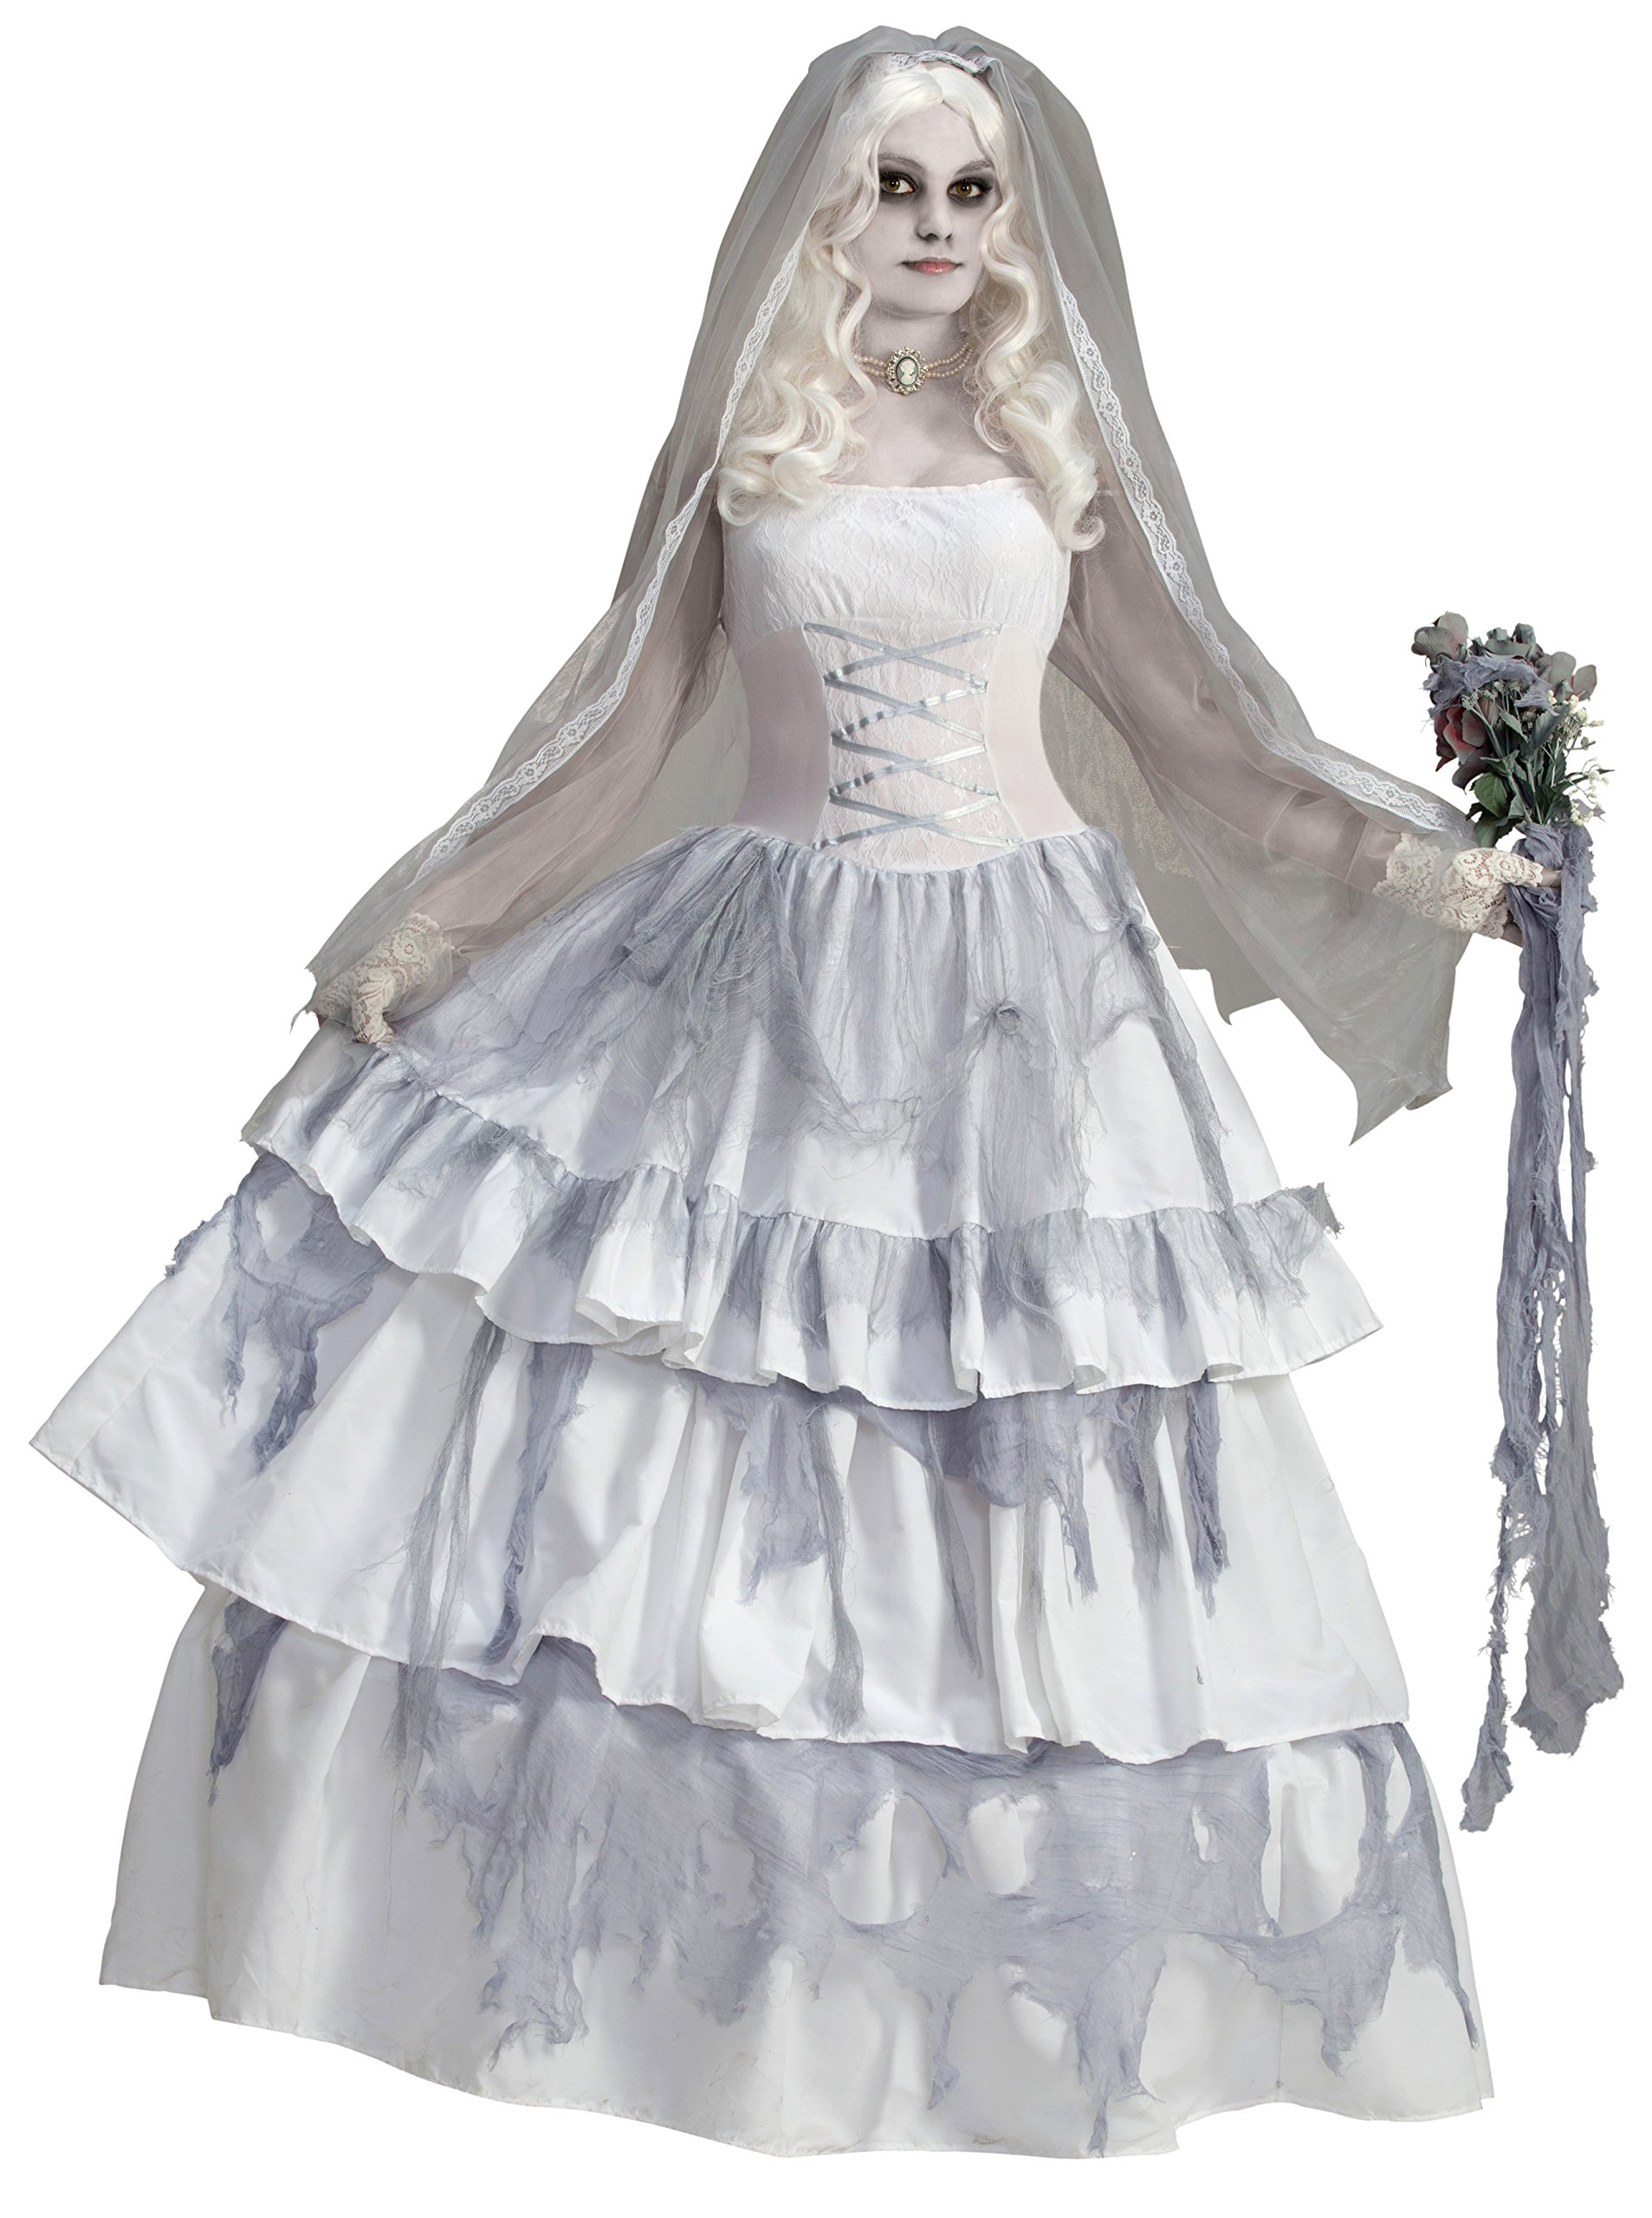 Forum Novelties Women's Deluxe Victorian Ghost Bride Costume, Multi, One Size